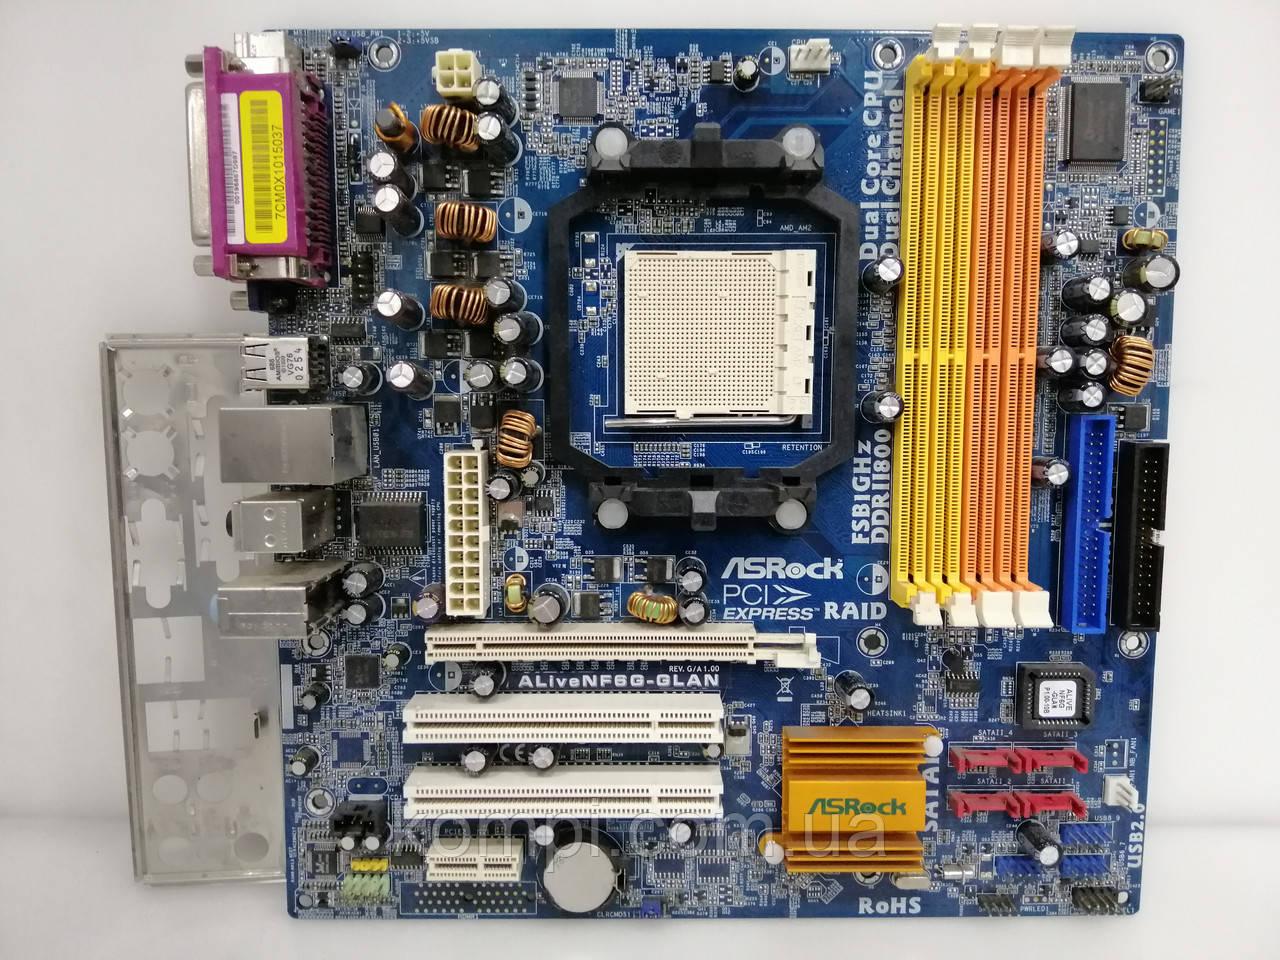 Материнская плата ASRock ALiveNF6G-GLAN AM2 DDR2